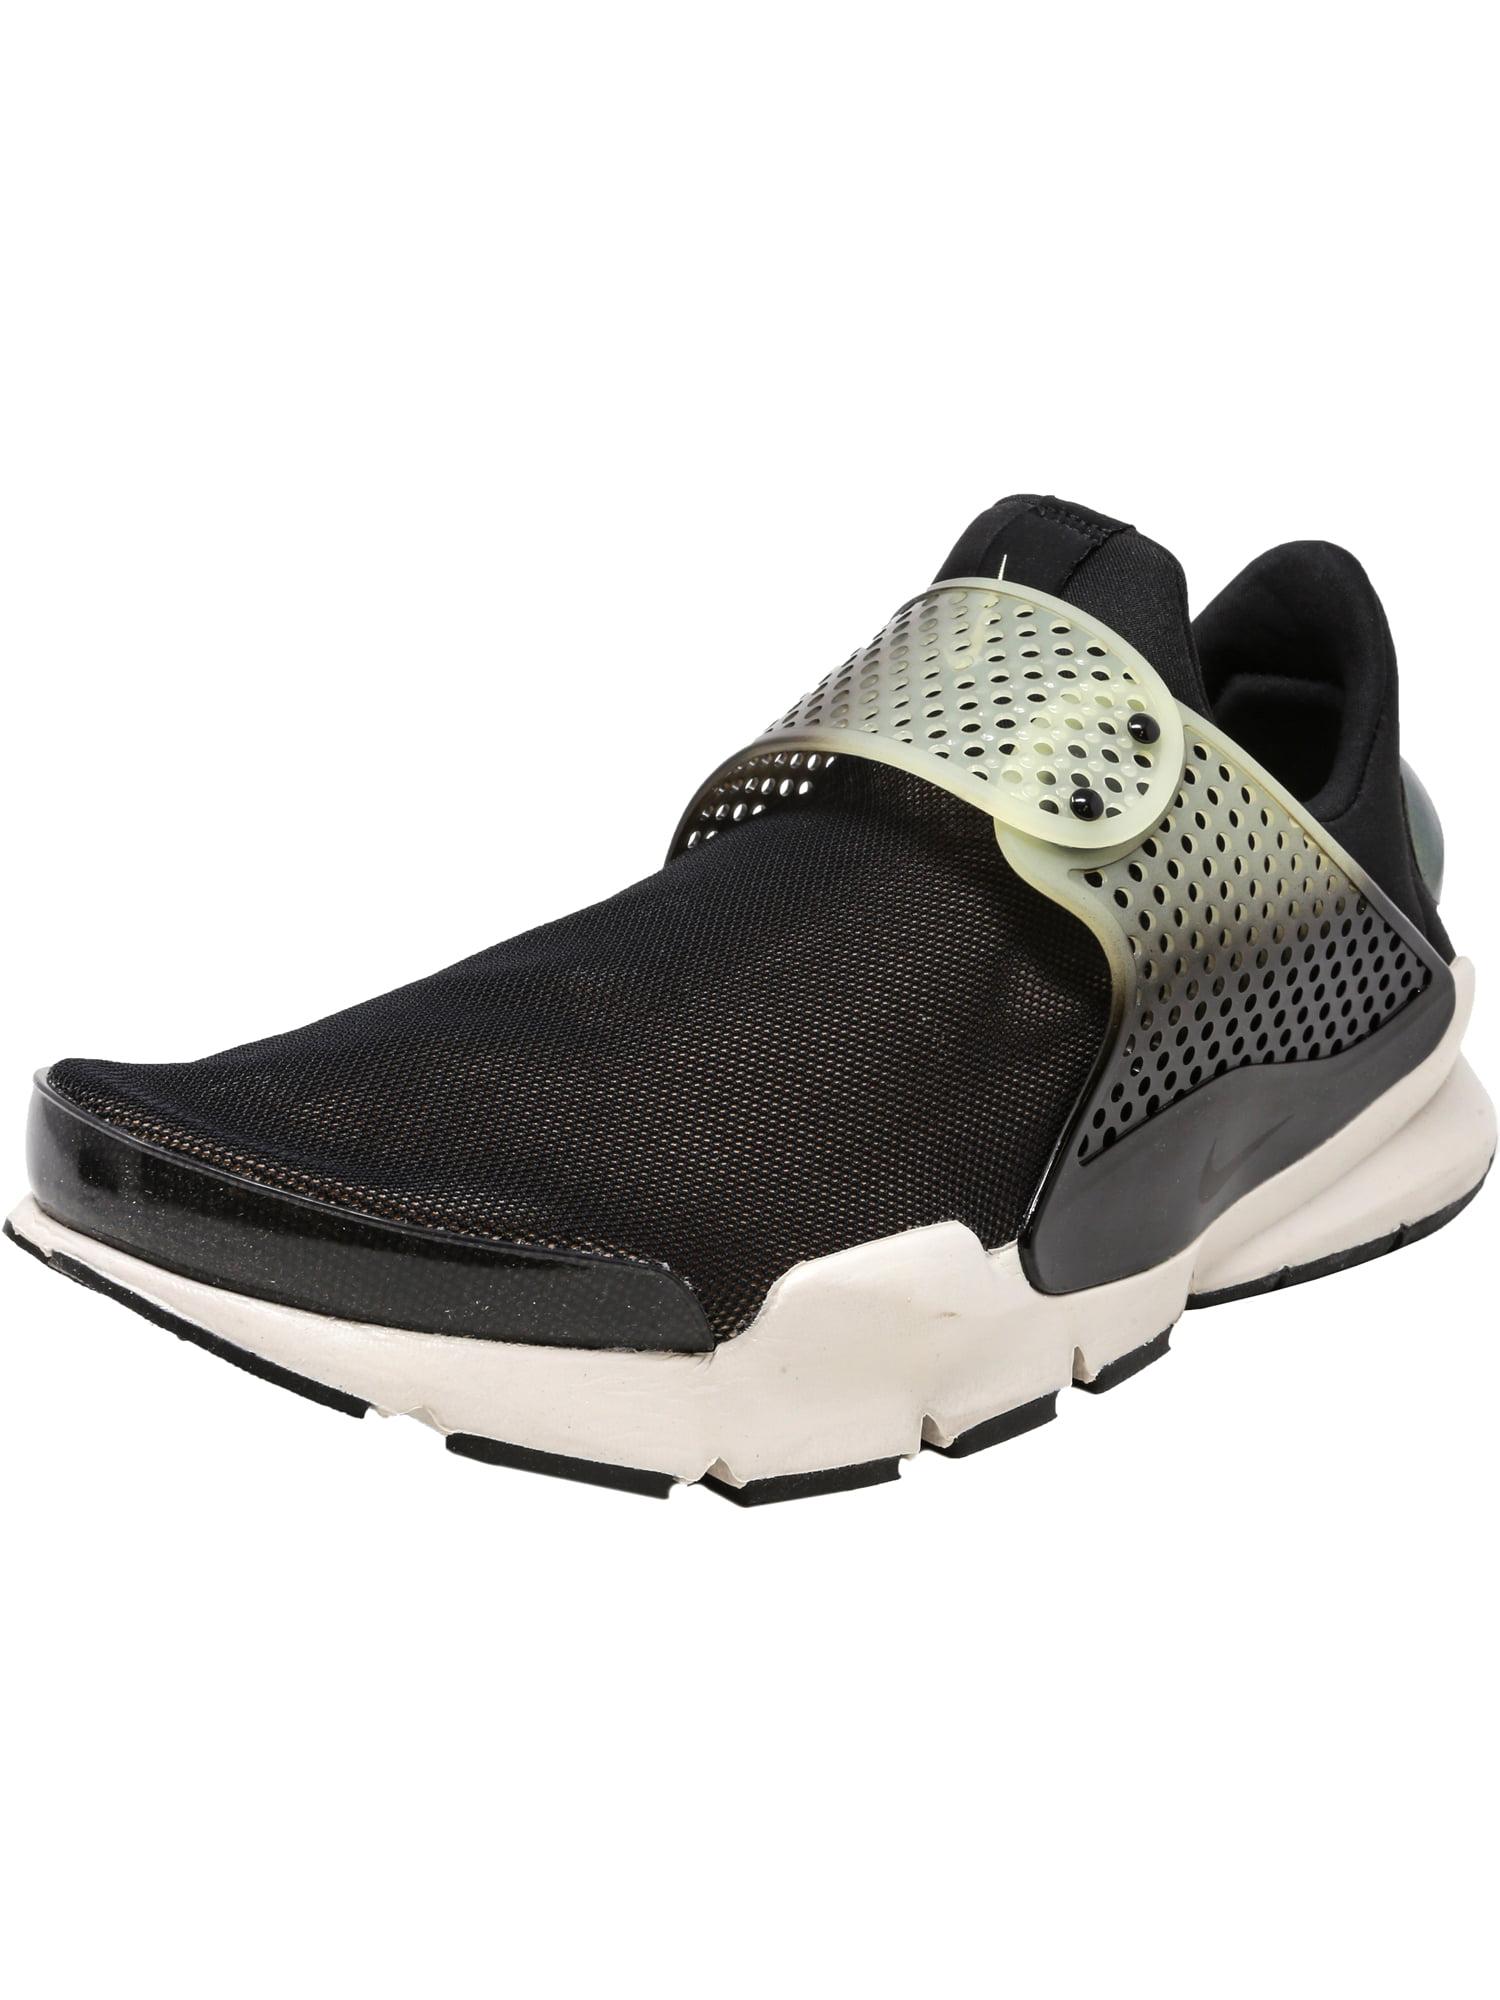 Nike Men's Sock Dart Se Premium Black / Bio Beige-Light Bone Low Top Running Shoe - 11M